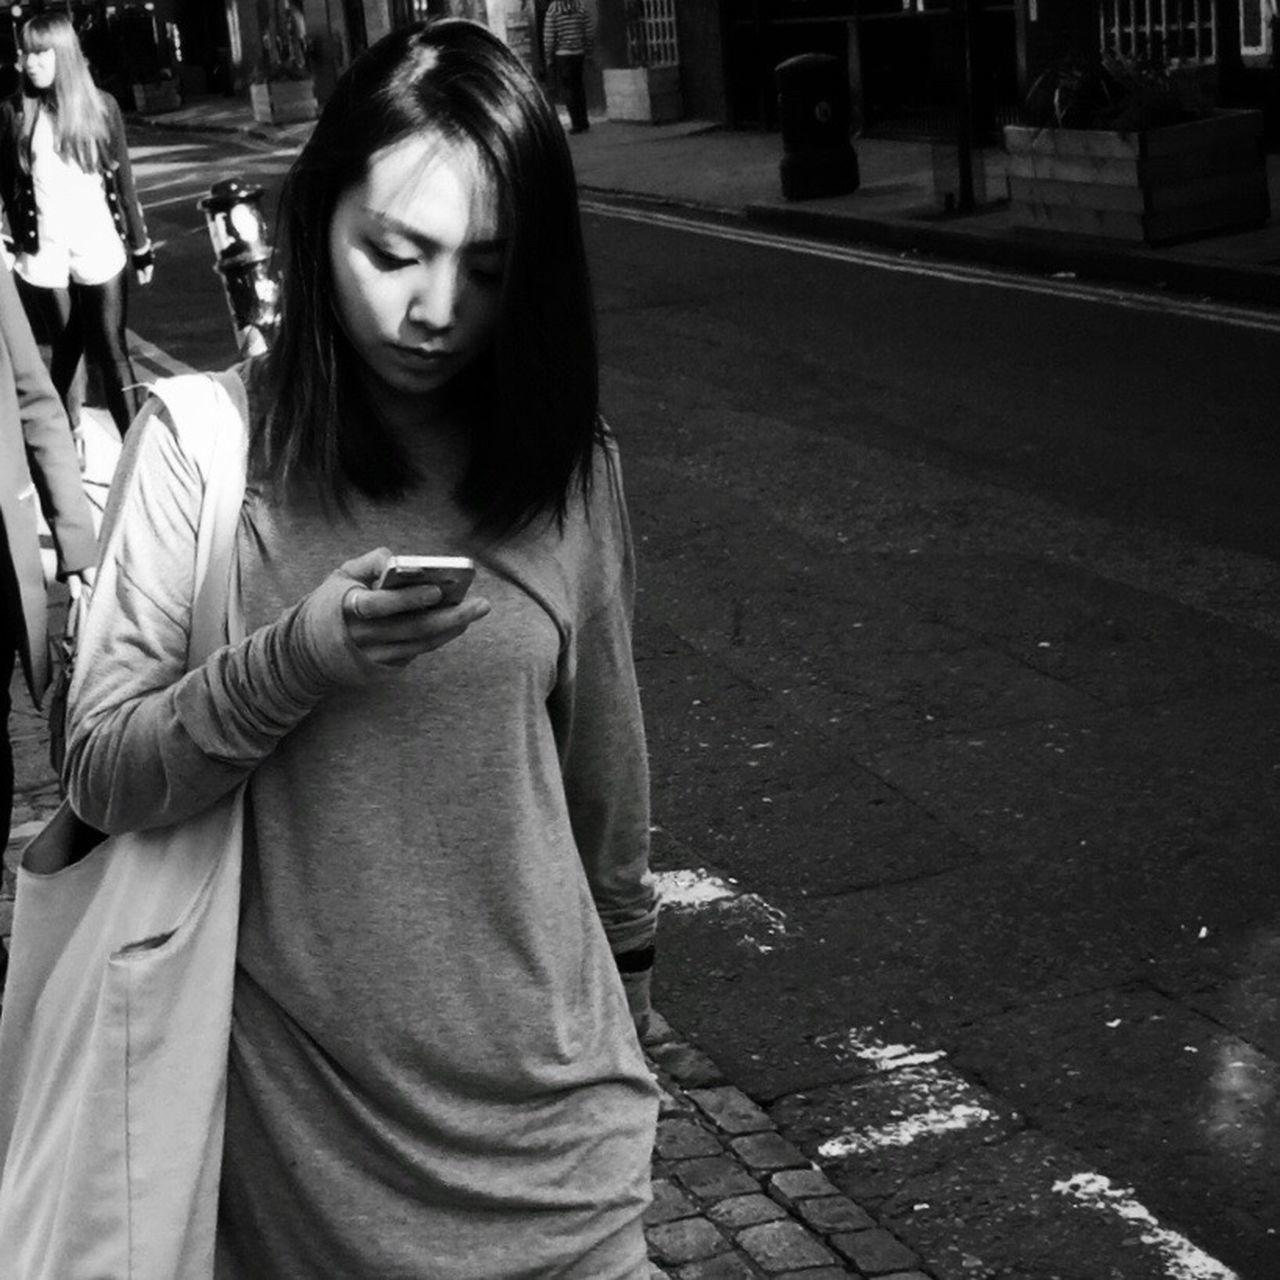 Streetphoto_bw Streetphotography_bw Streetphotography Blancoynegro Blackandwhite Monochrome Street Life London Flaneur NEM Black&white Street Contrast AMPt - Street